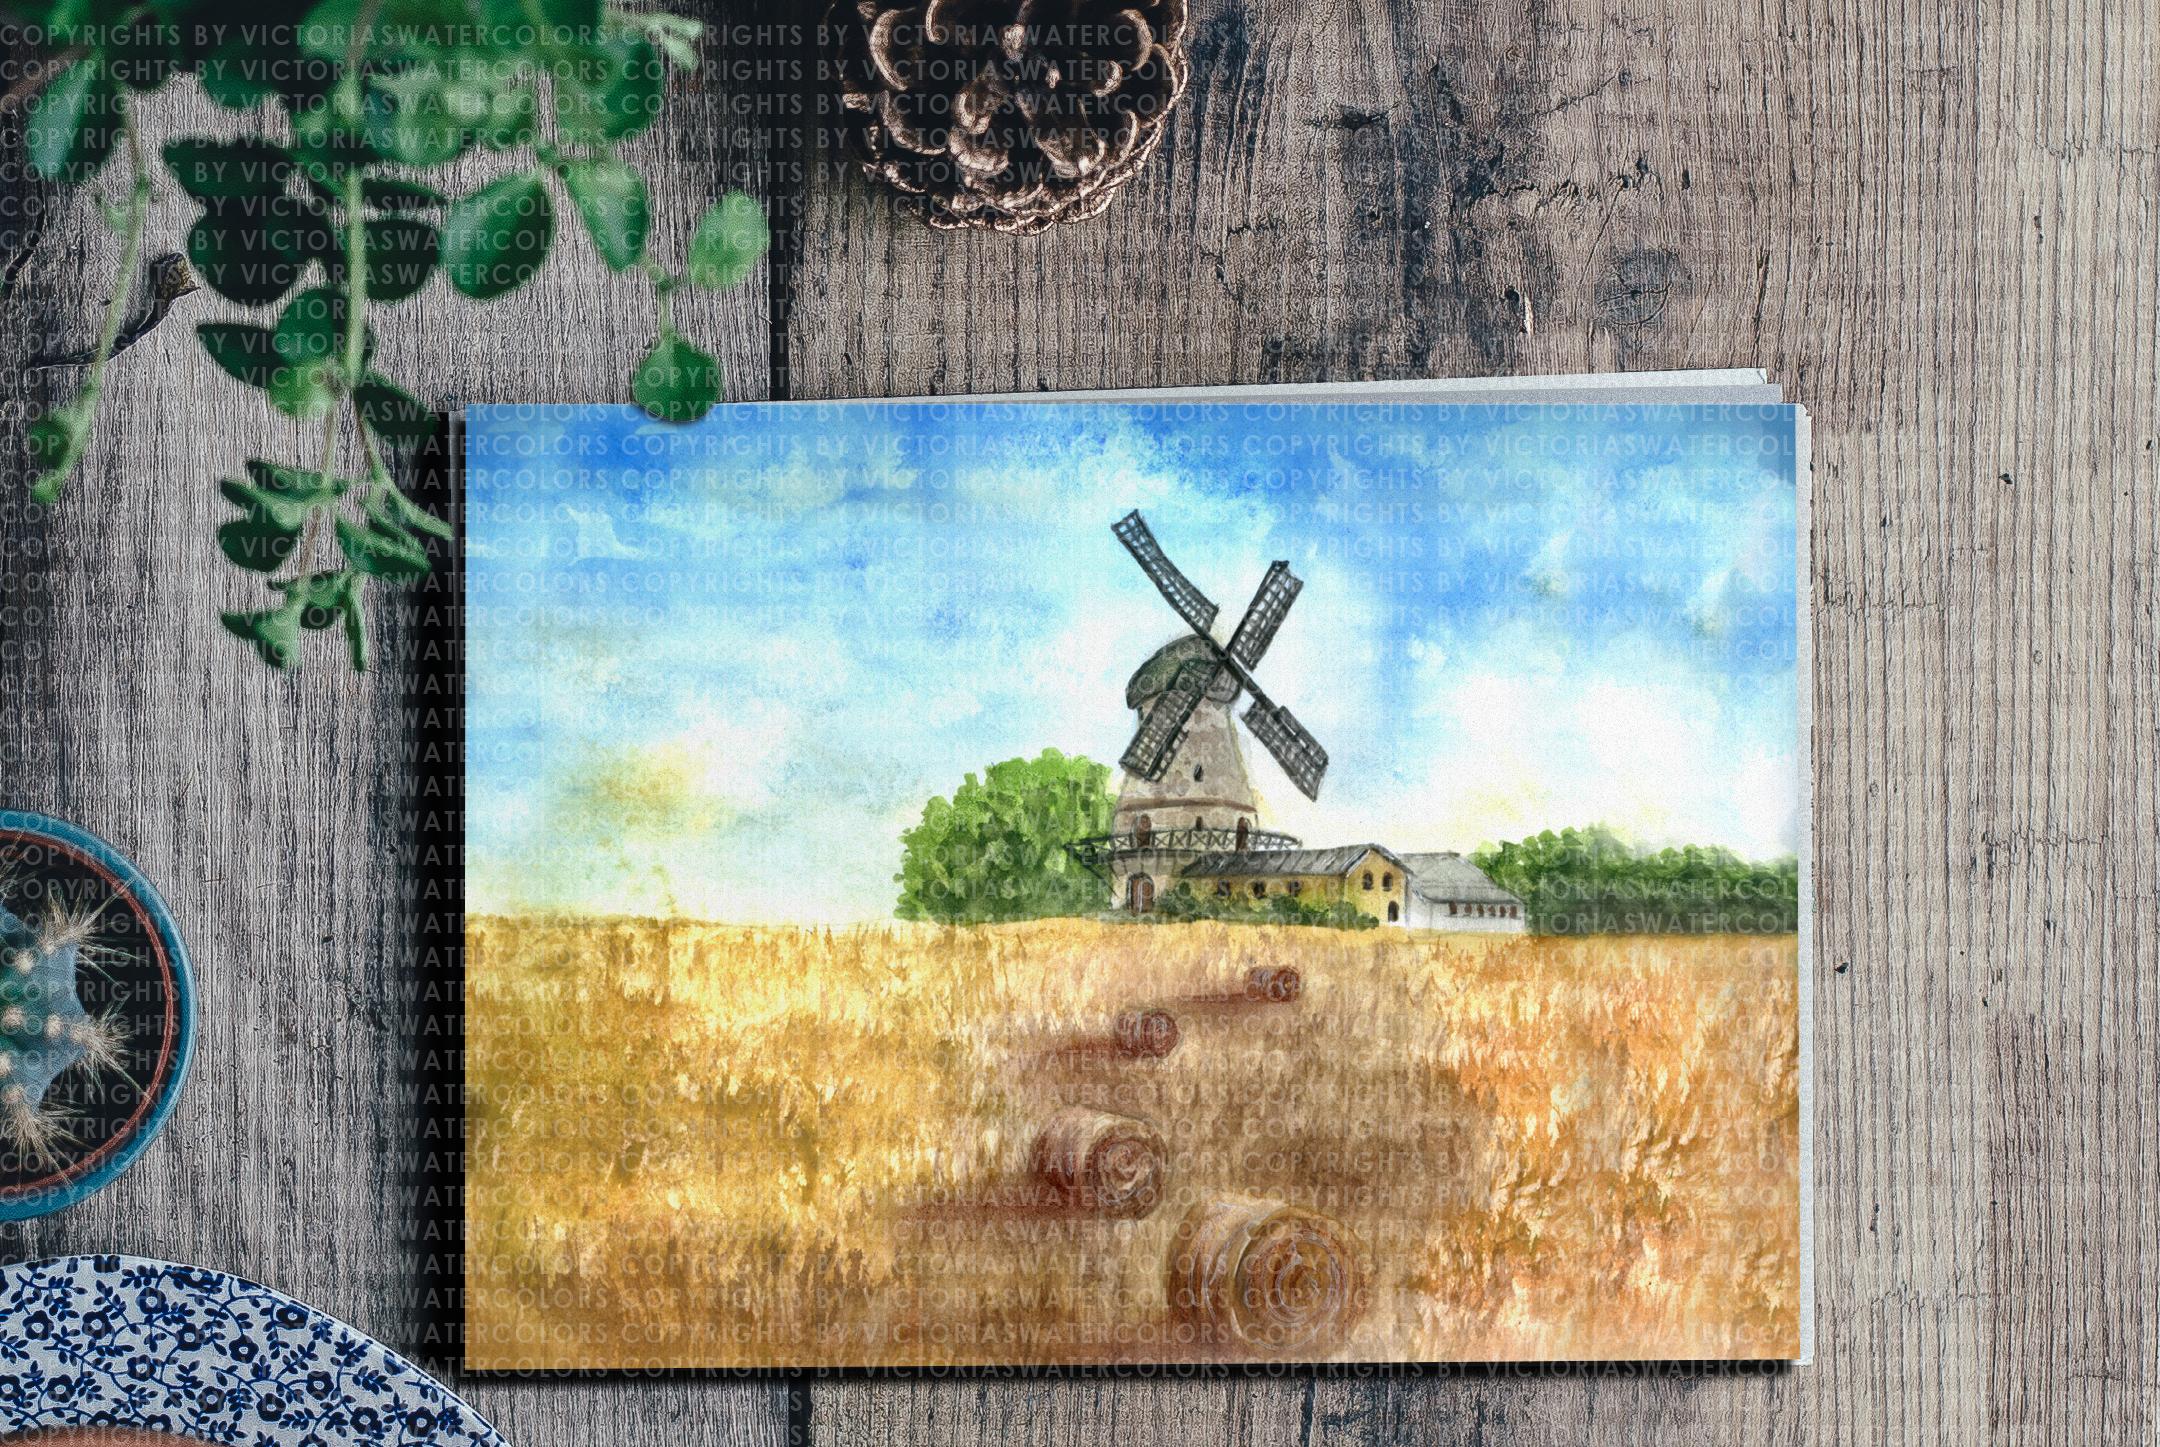 Watercolor Landscape Bundle Watercolor Beach Sunset Galaxy Texture Watercolor Farm Windmill example image 3